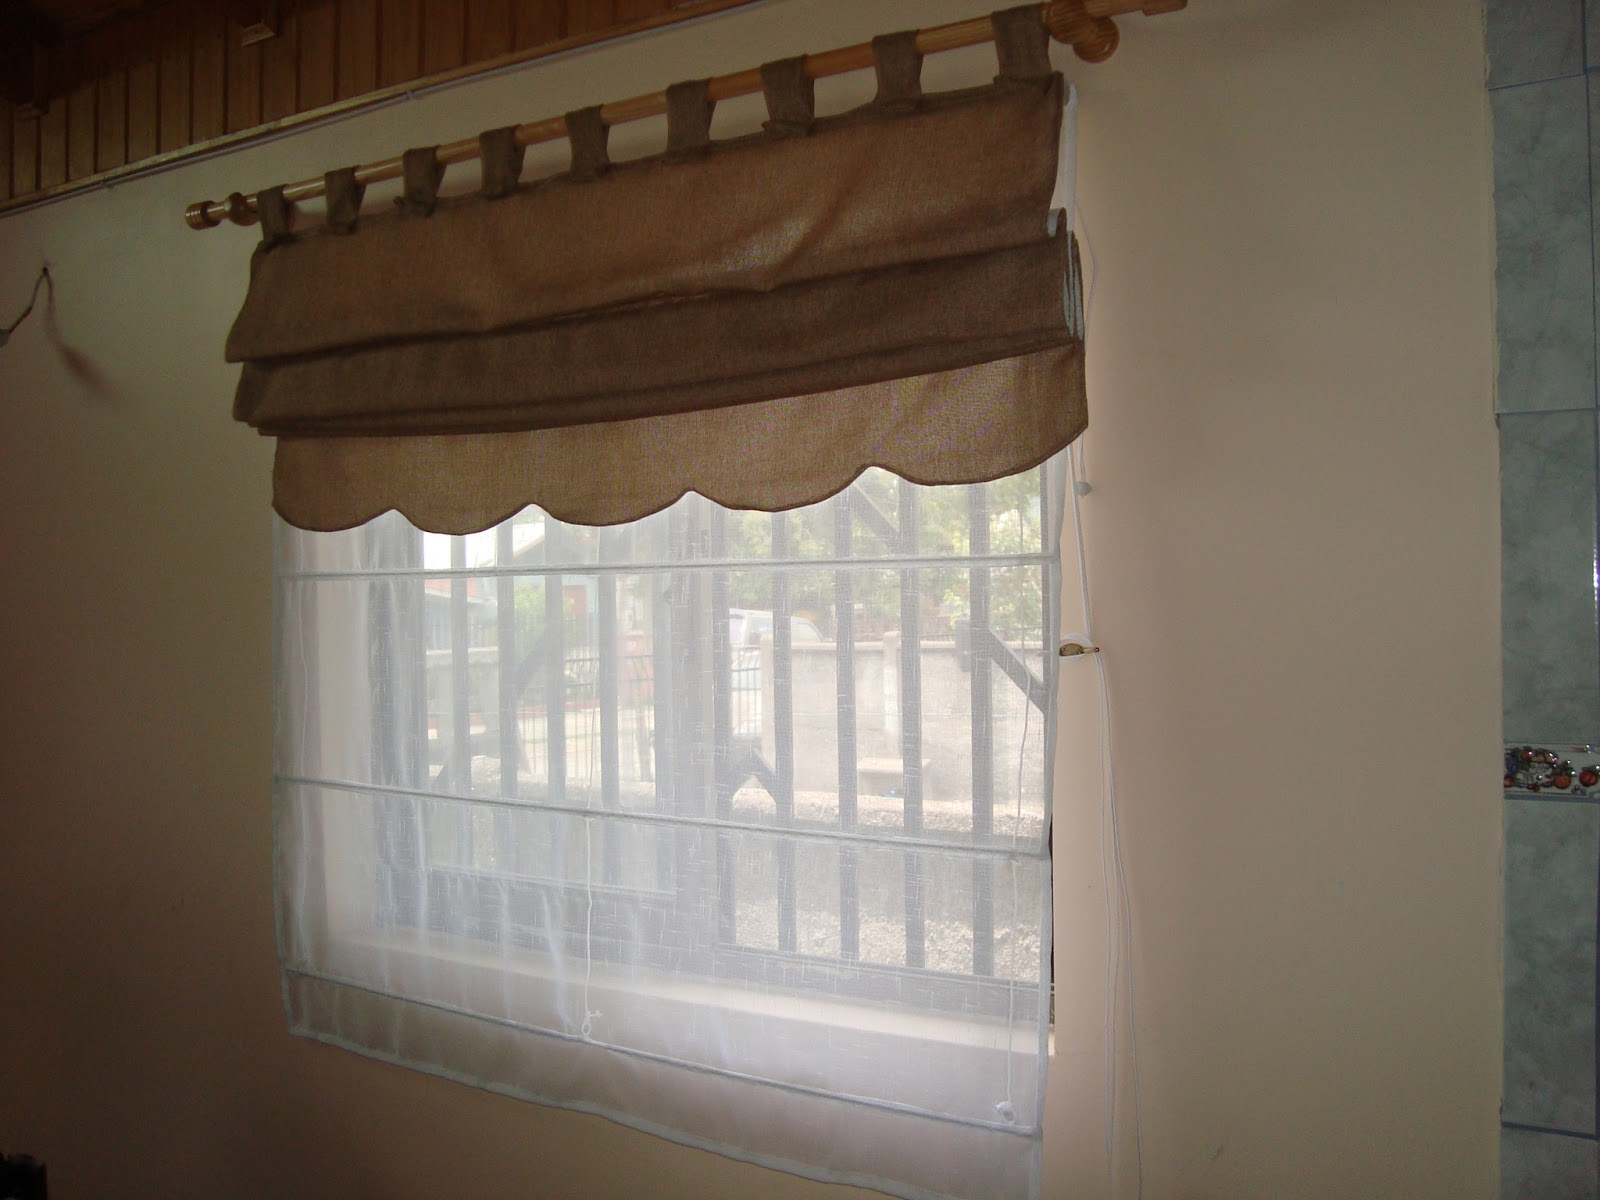 Decoracion store living comedor con barras de madera for Decoracion de cortinas para comedor